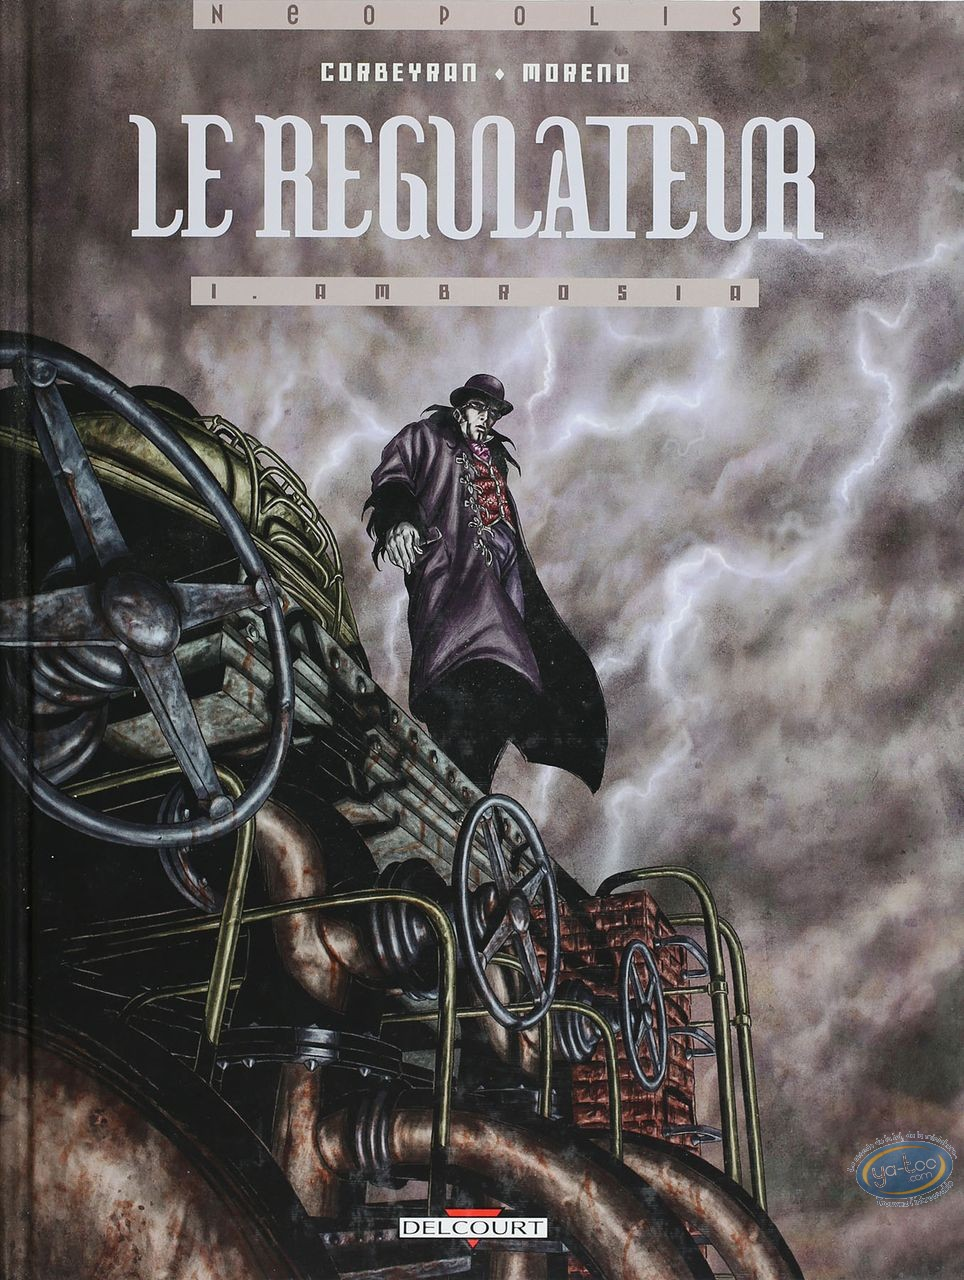 Listed European Comic Books, Régulateur (Le) : Ambrosia (dedication + bookplate)